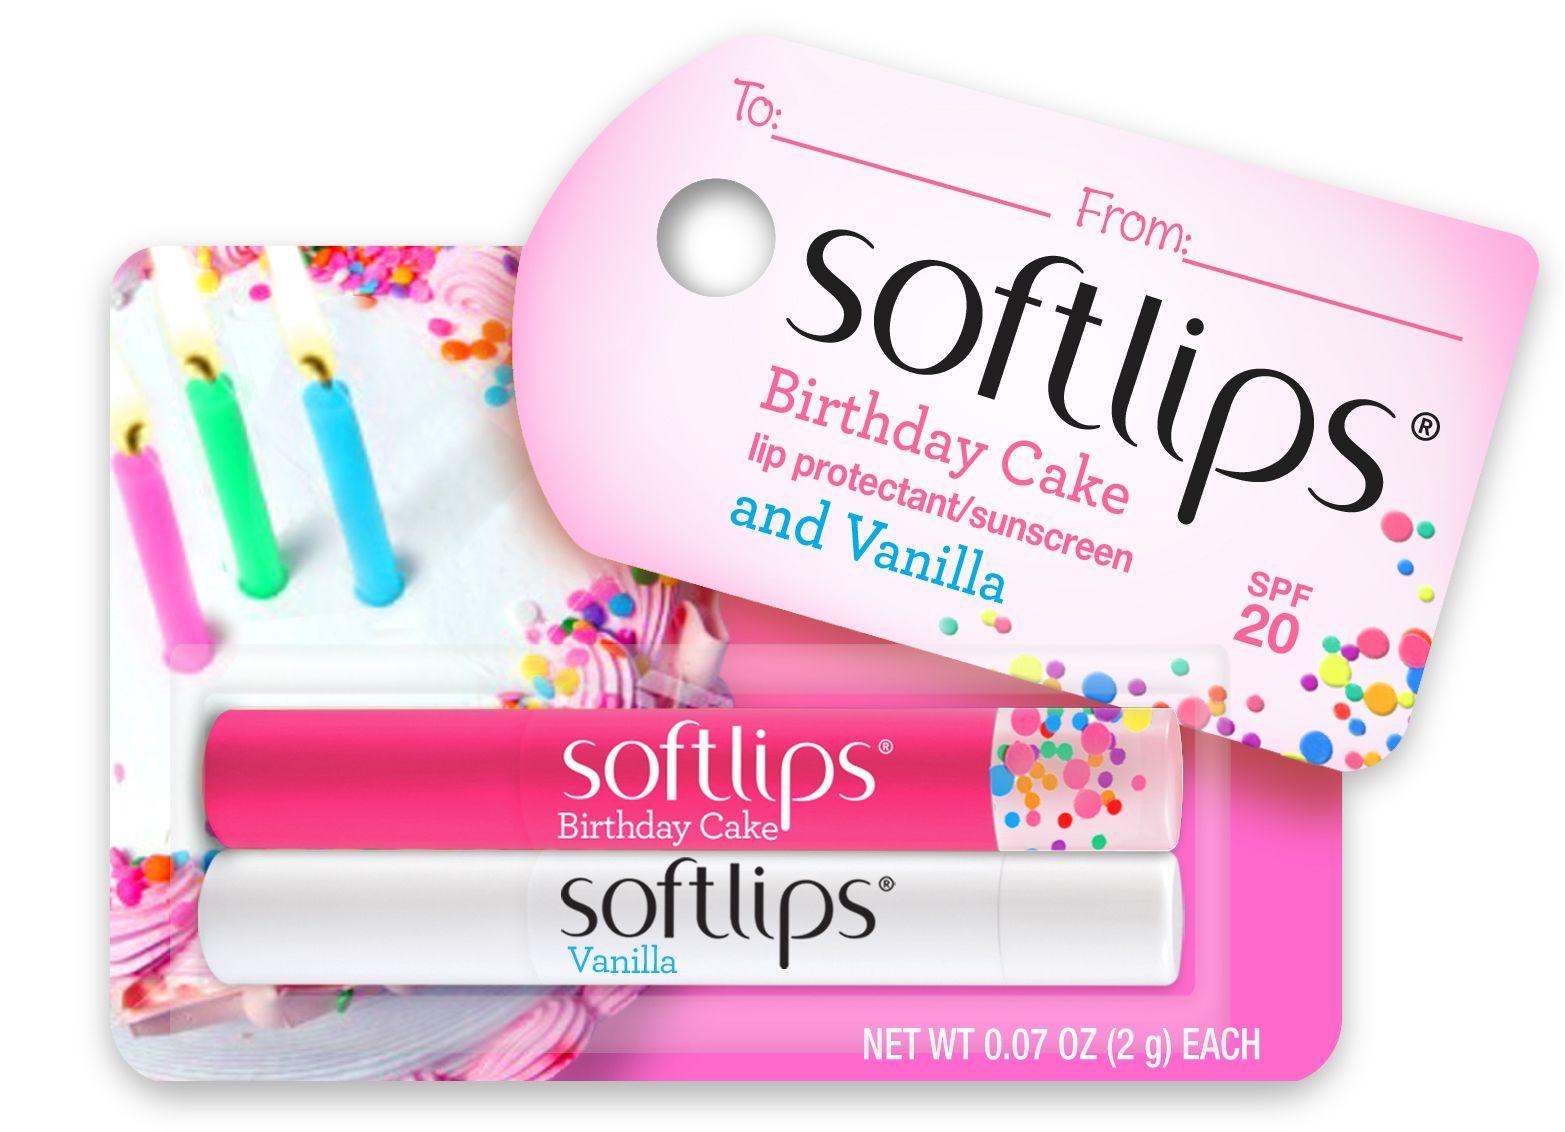 SoftlipsR Birthday Cake Softlipslipbalm Influenster